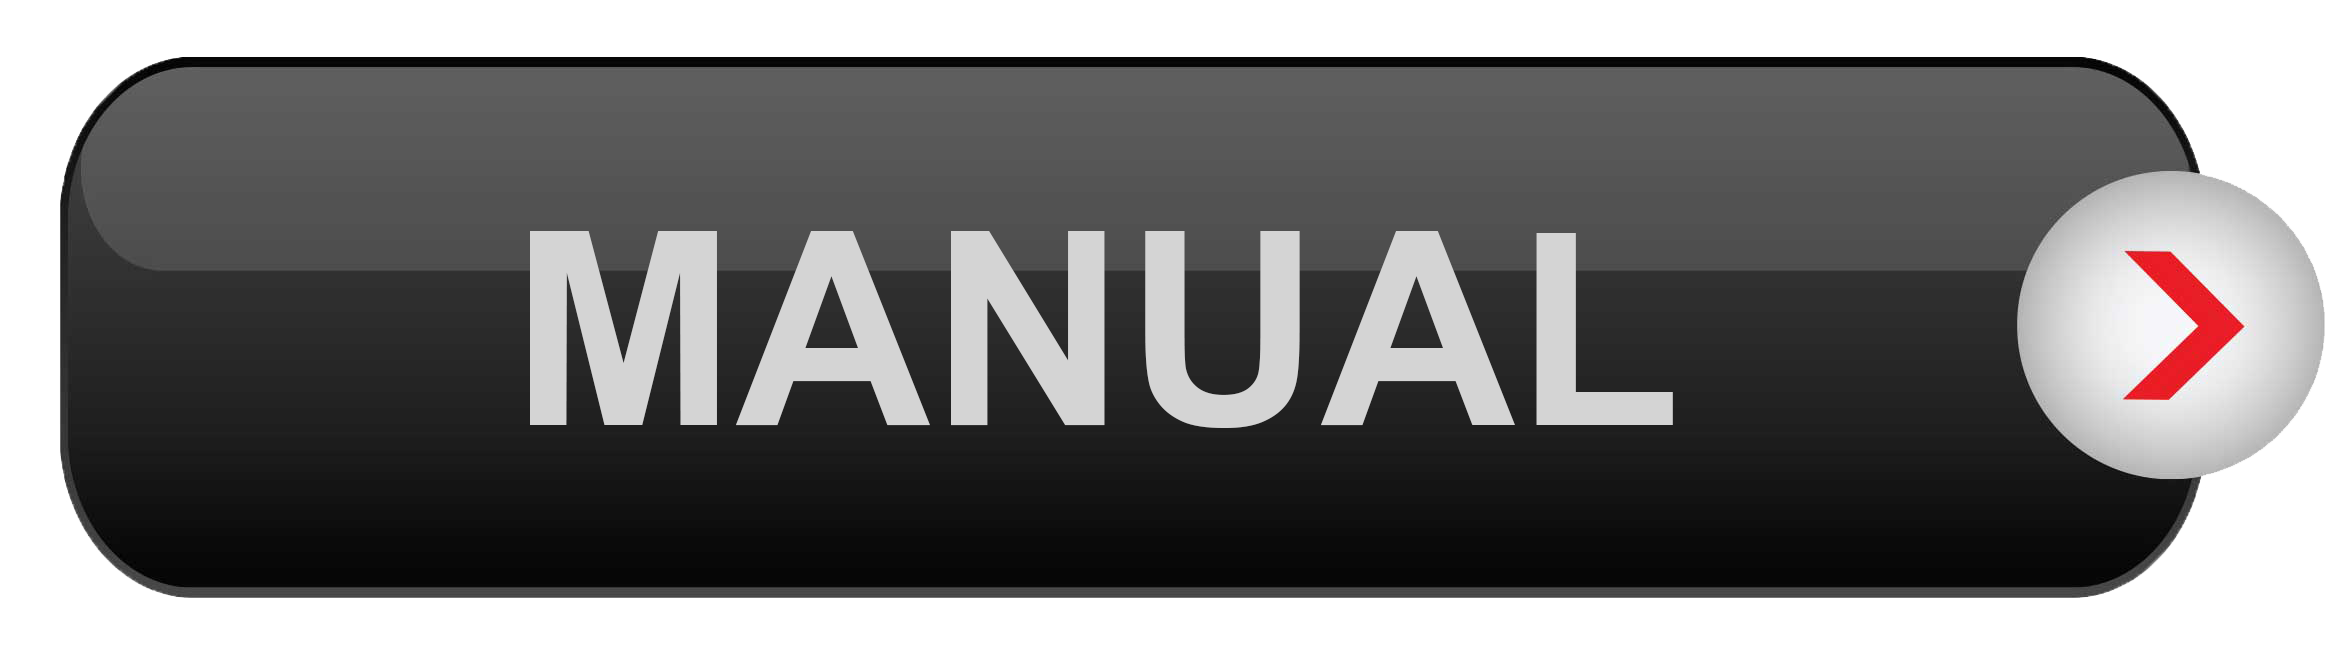 MANUAL_button